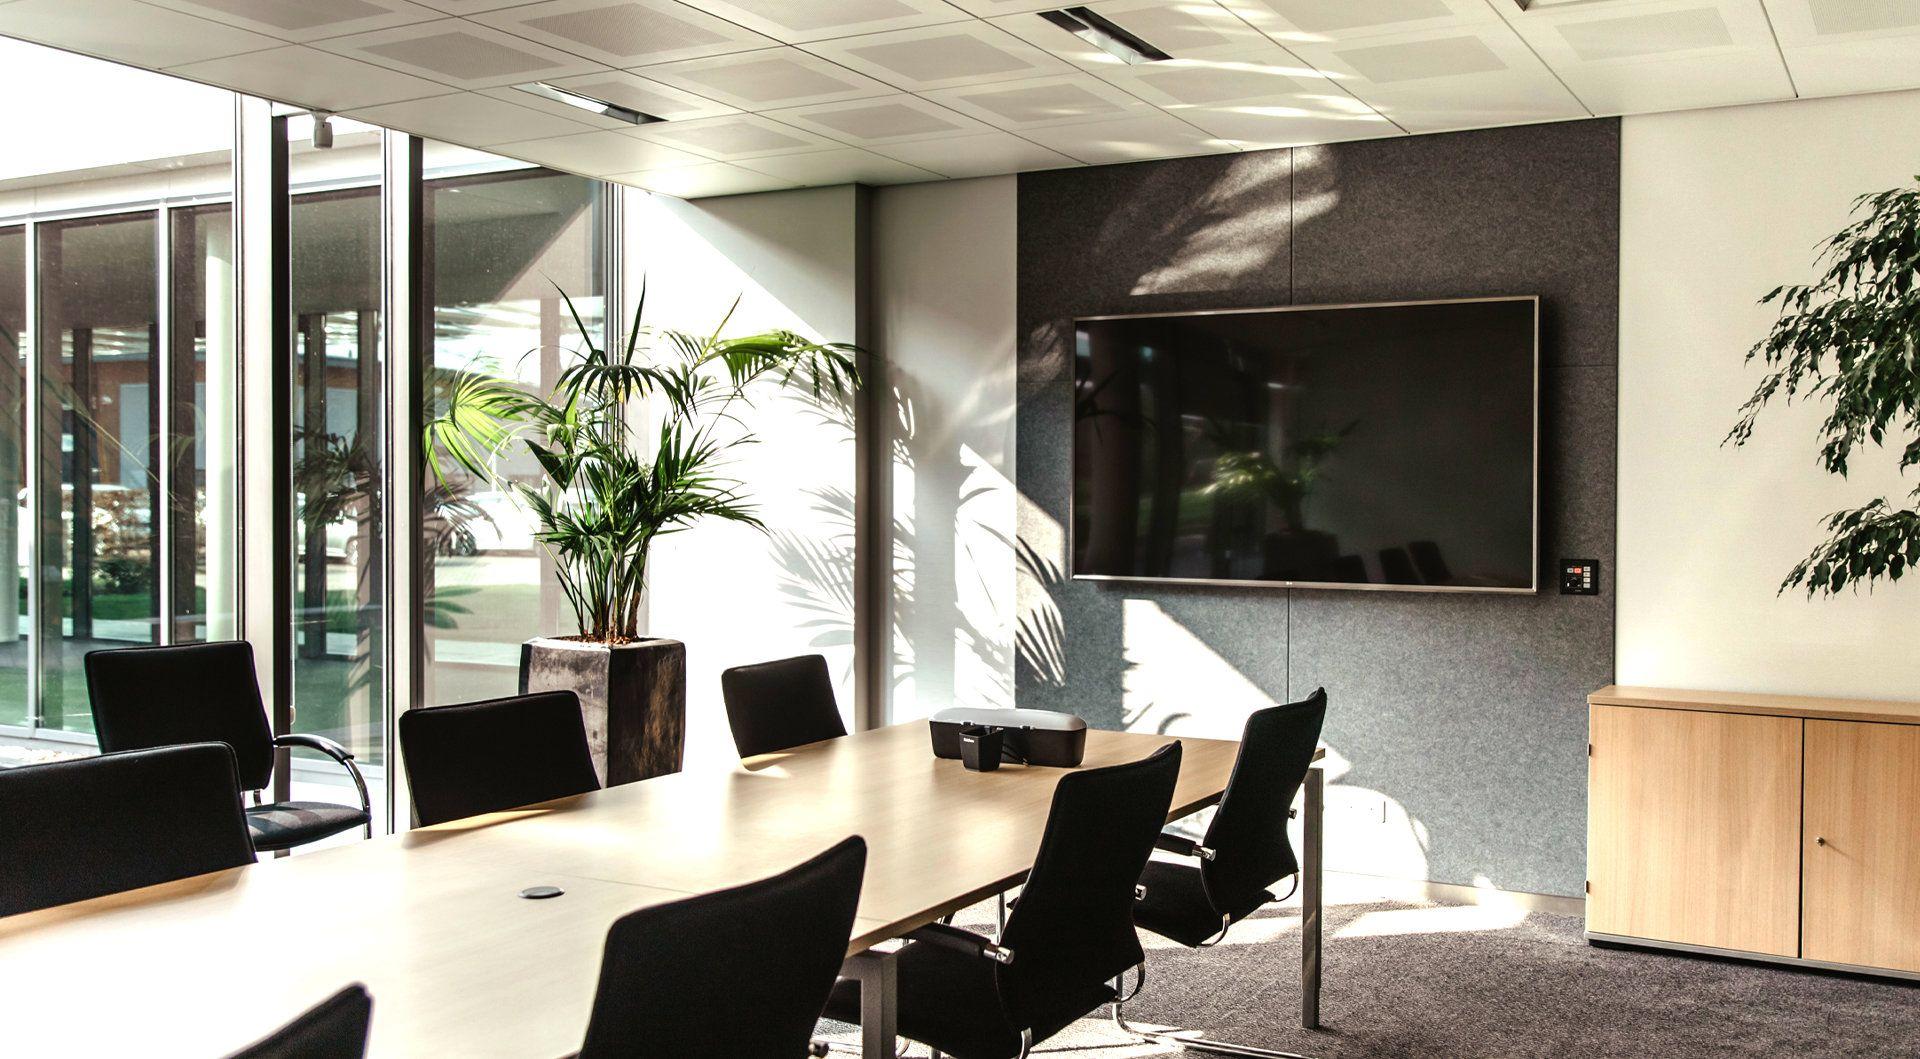 "LG 55LV35A beeldkrant 139,7 cm (55"") LED Full HD Digitale signage flatscreen Zwart - Case studie de vries"